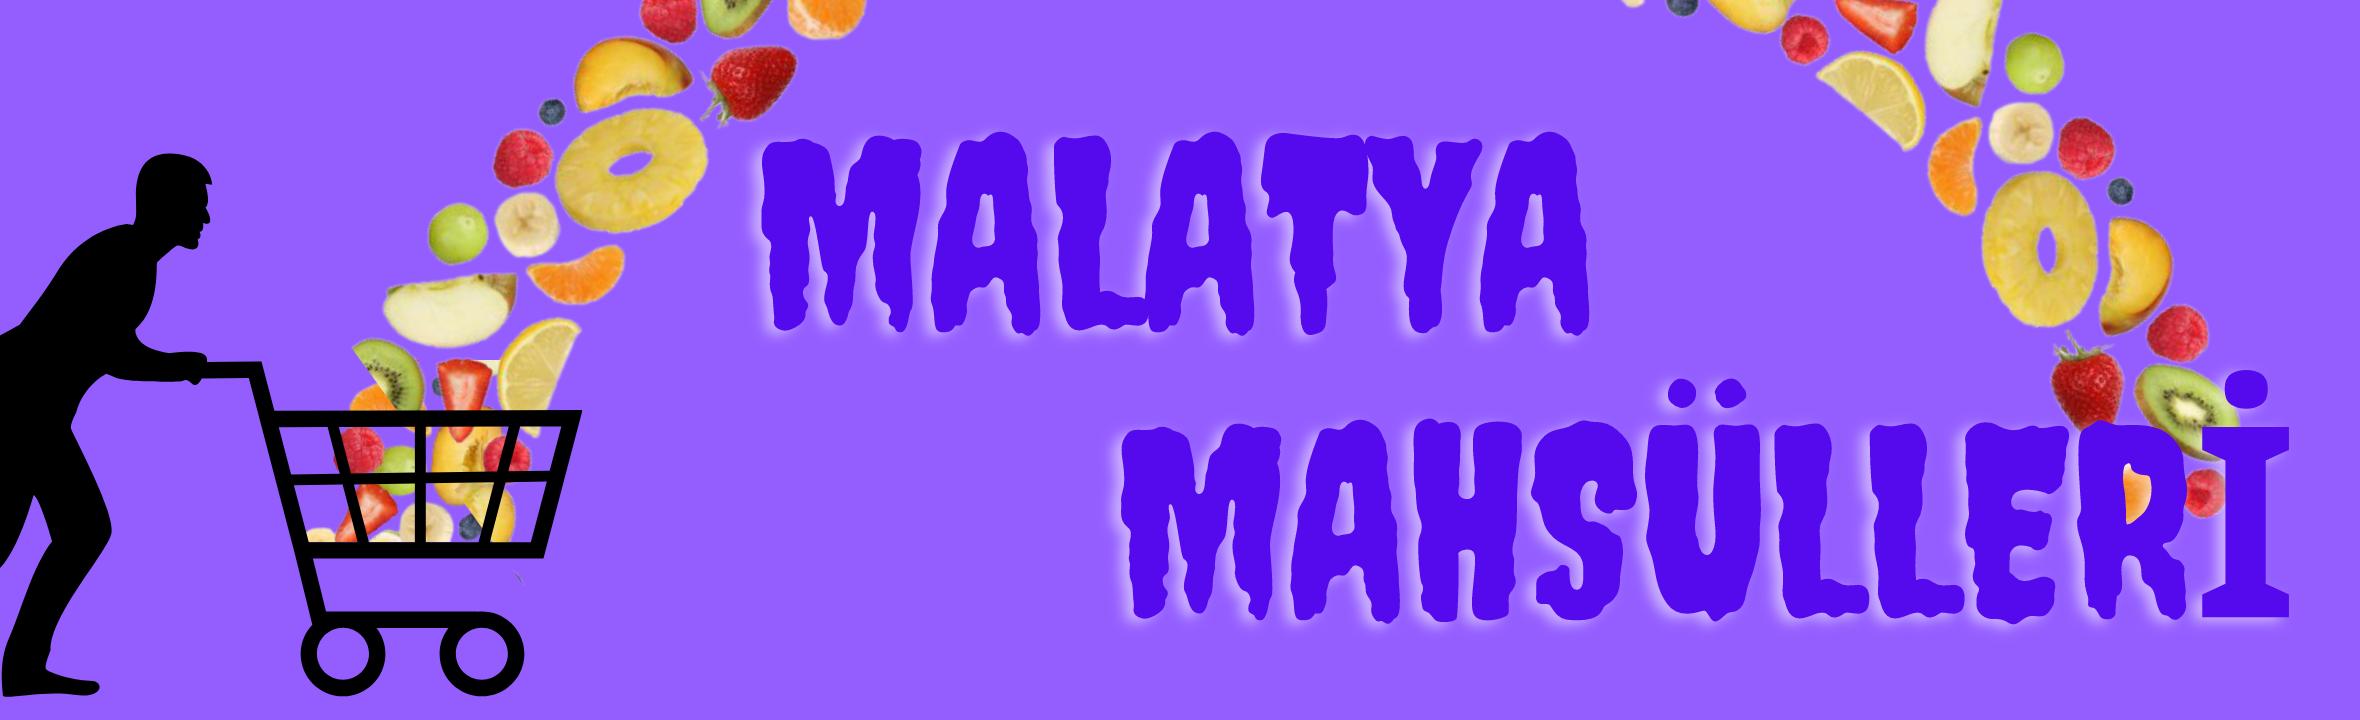 Malatya Mahsülleri